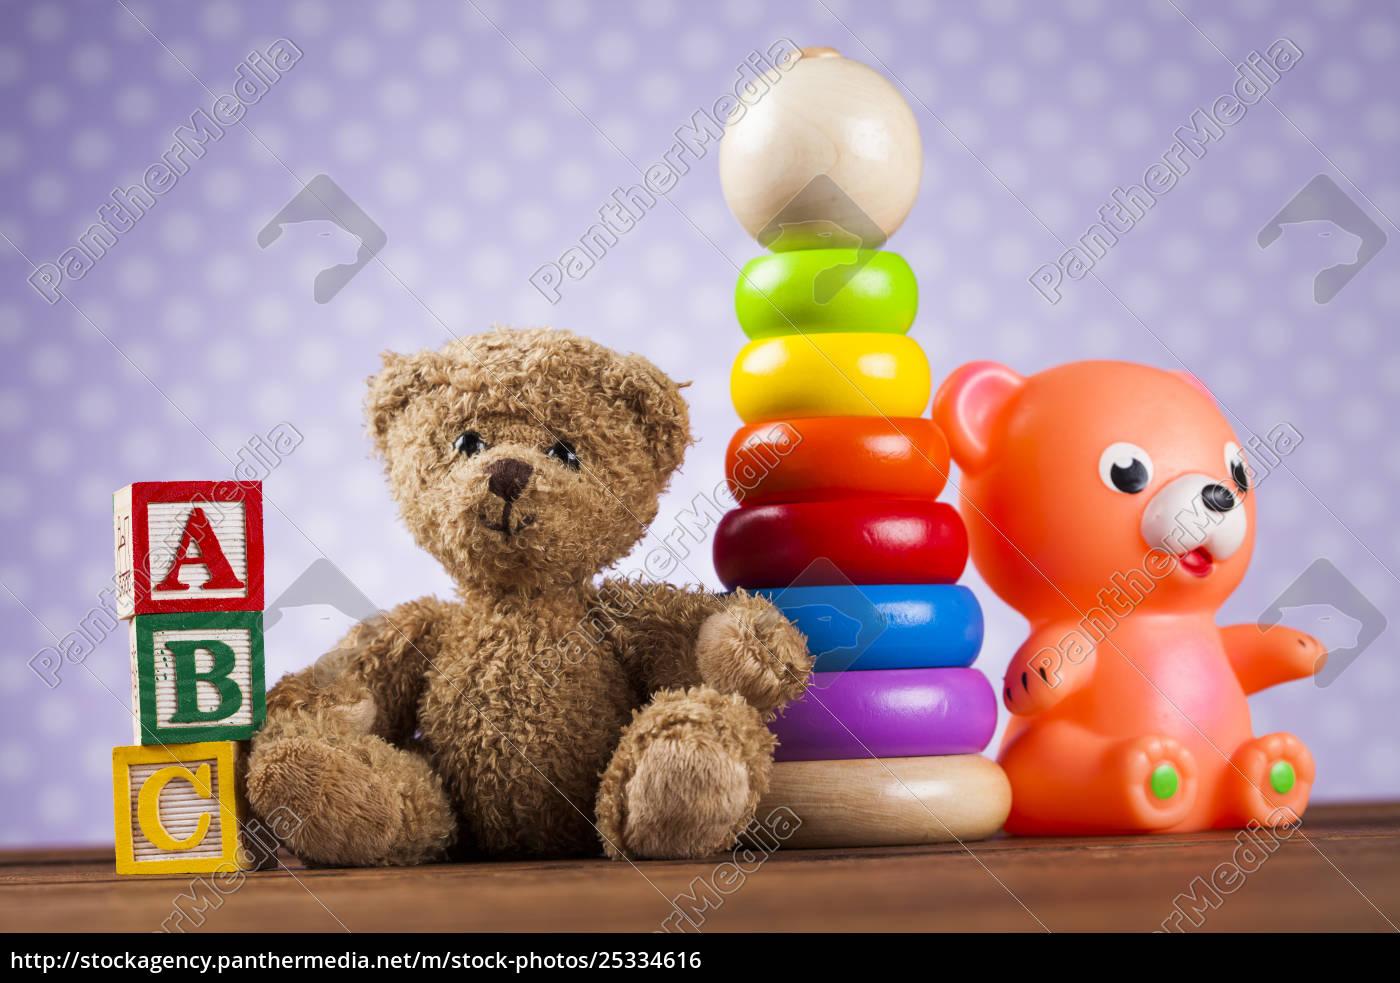 children's, of, toy, accessories, on, wooden - 25334616